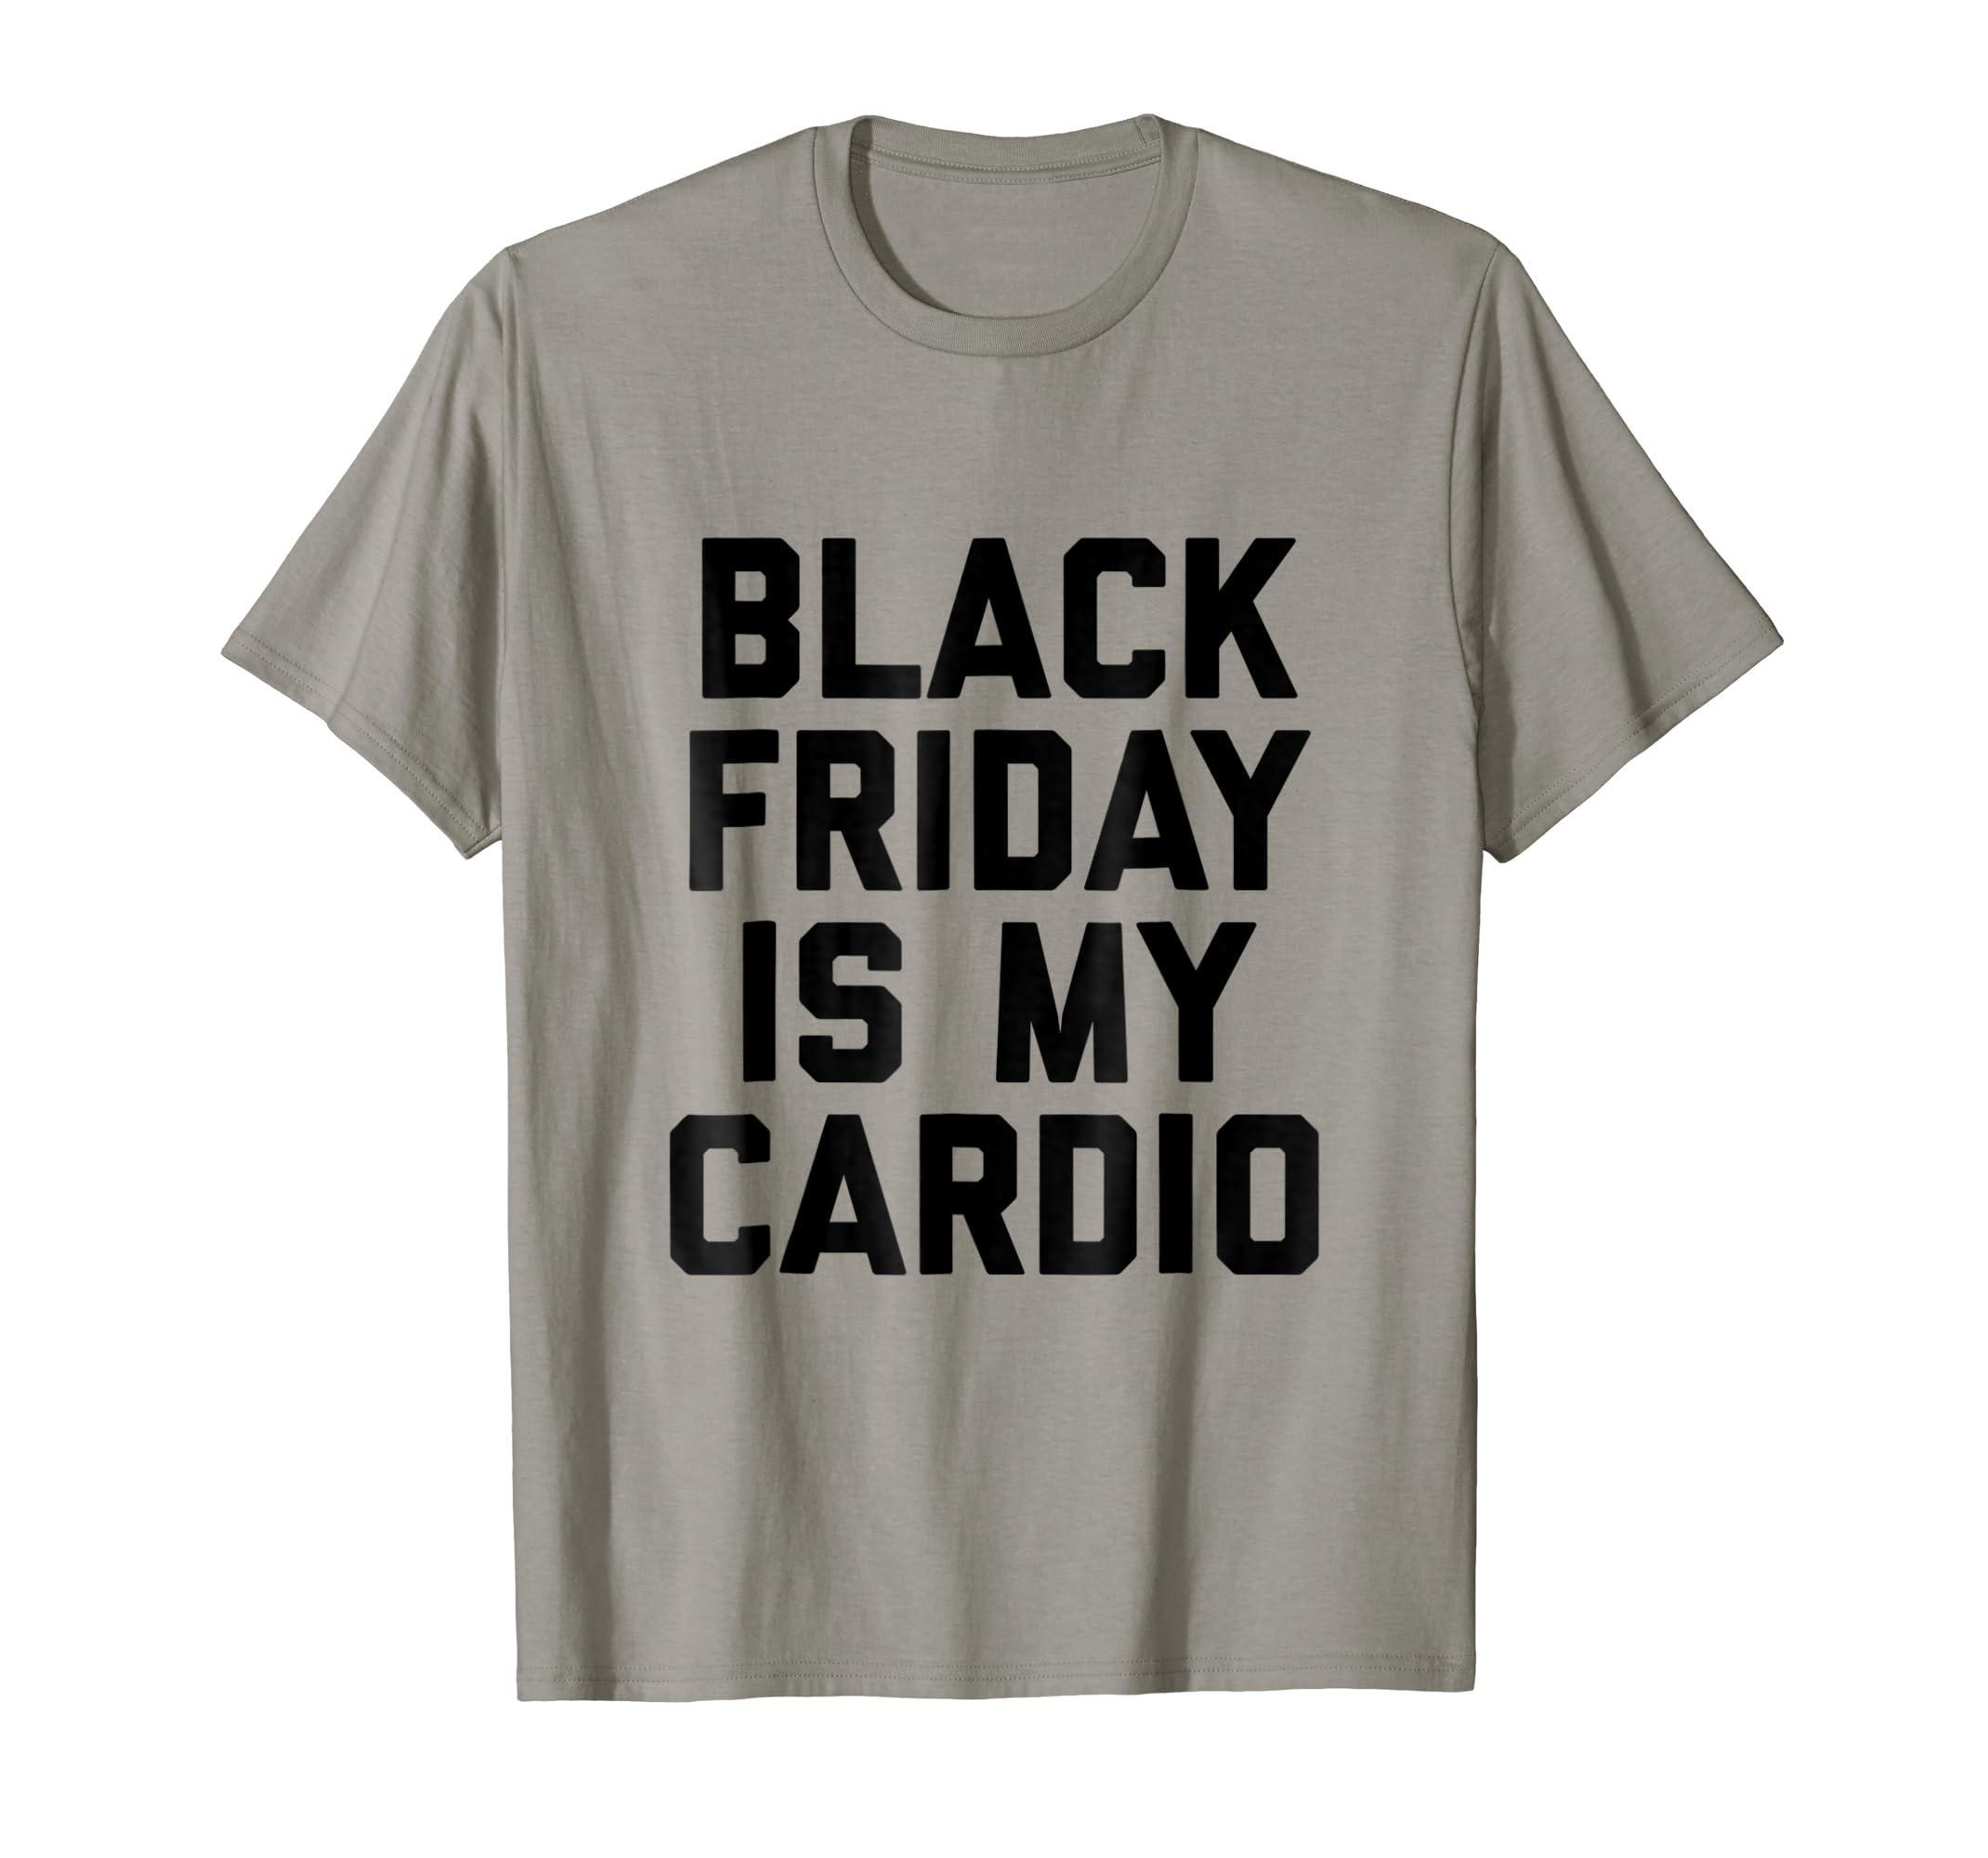 469e132b Amazon.com: Black Friday Is My Cardio Funny Black Friday T Shirt: Clothing